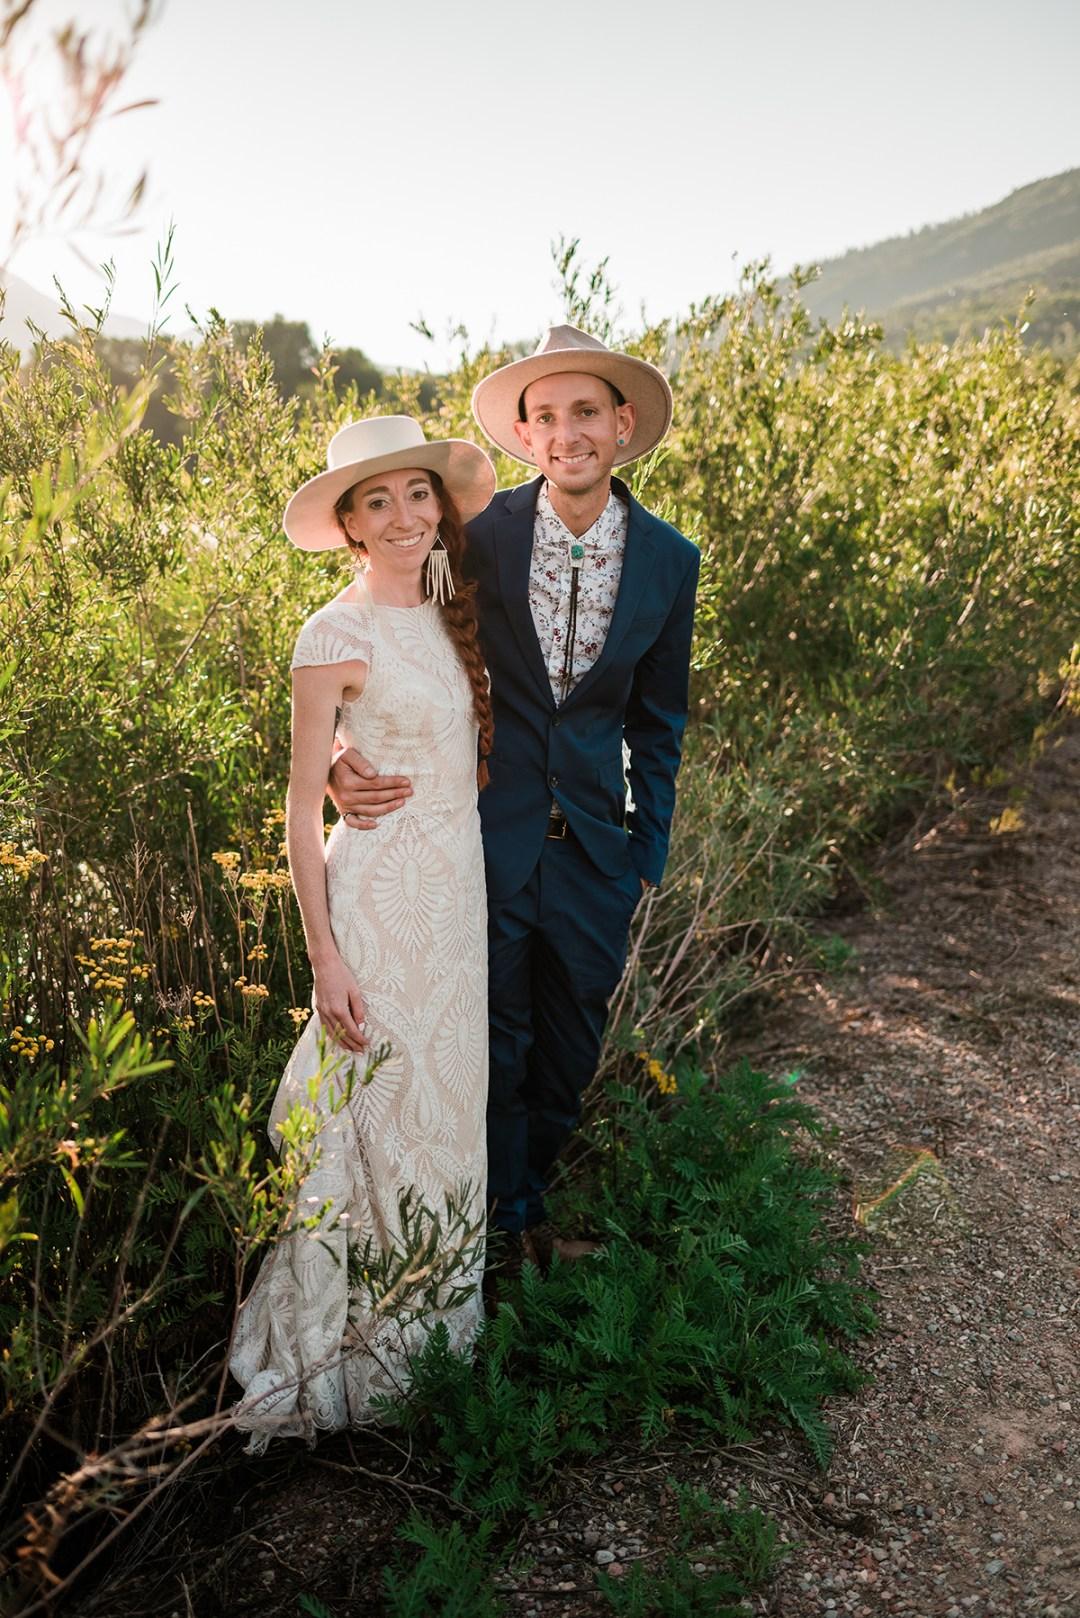 Solomon & Laura   Micro Wedding in Marble